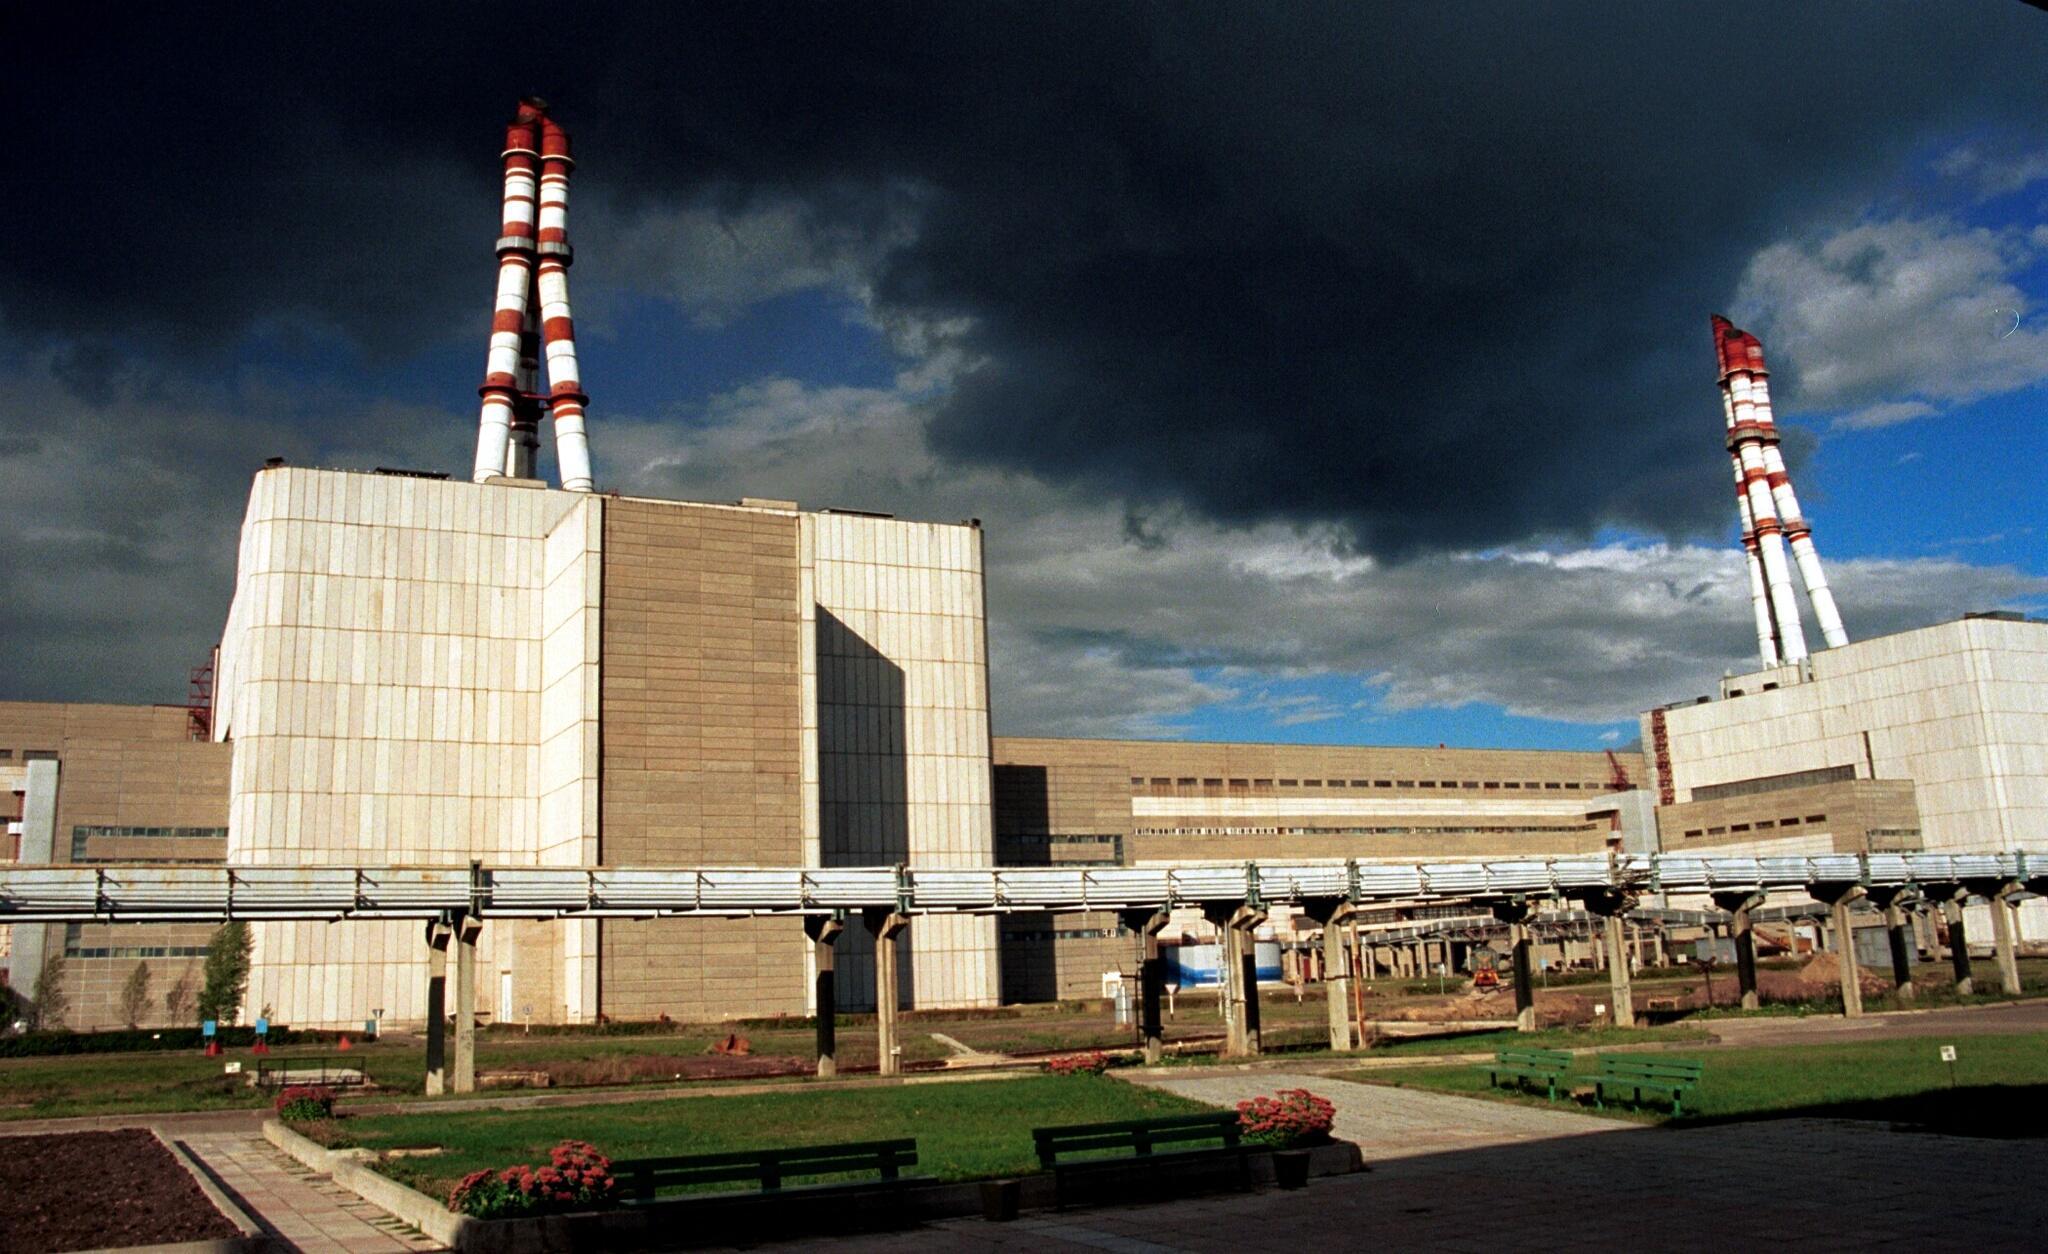 Ignalina-atomkraftværket